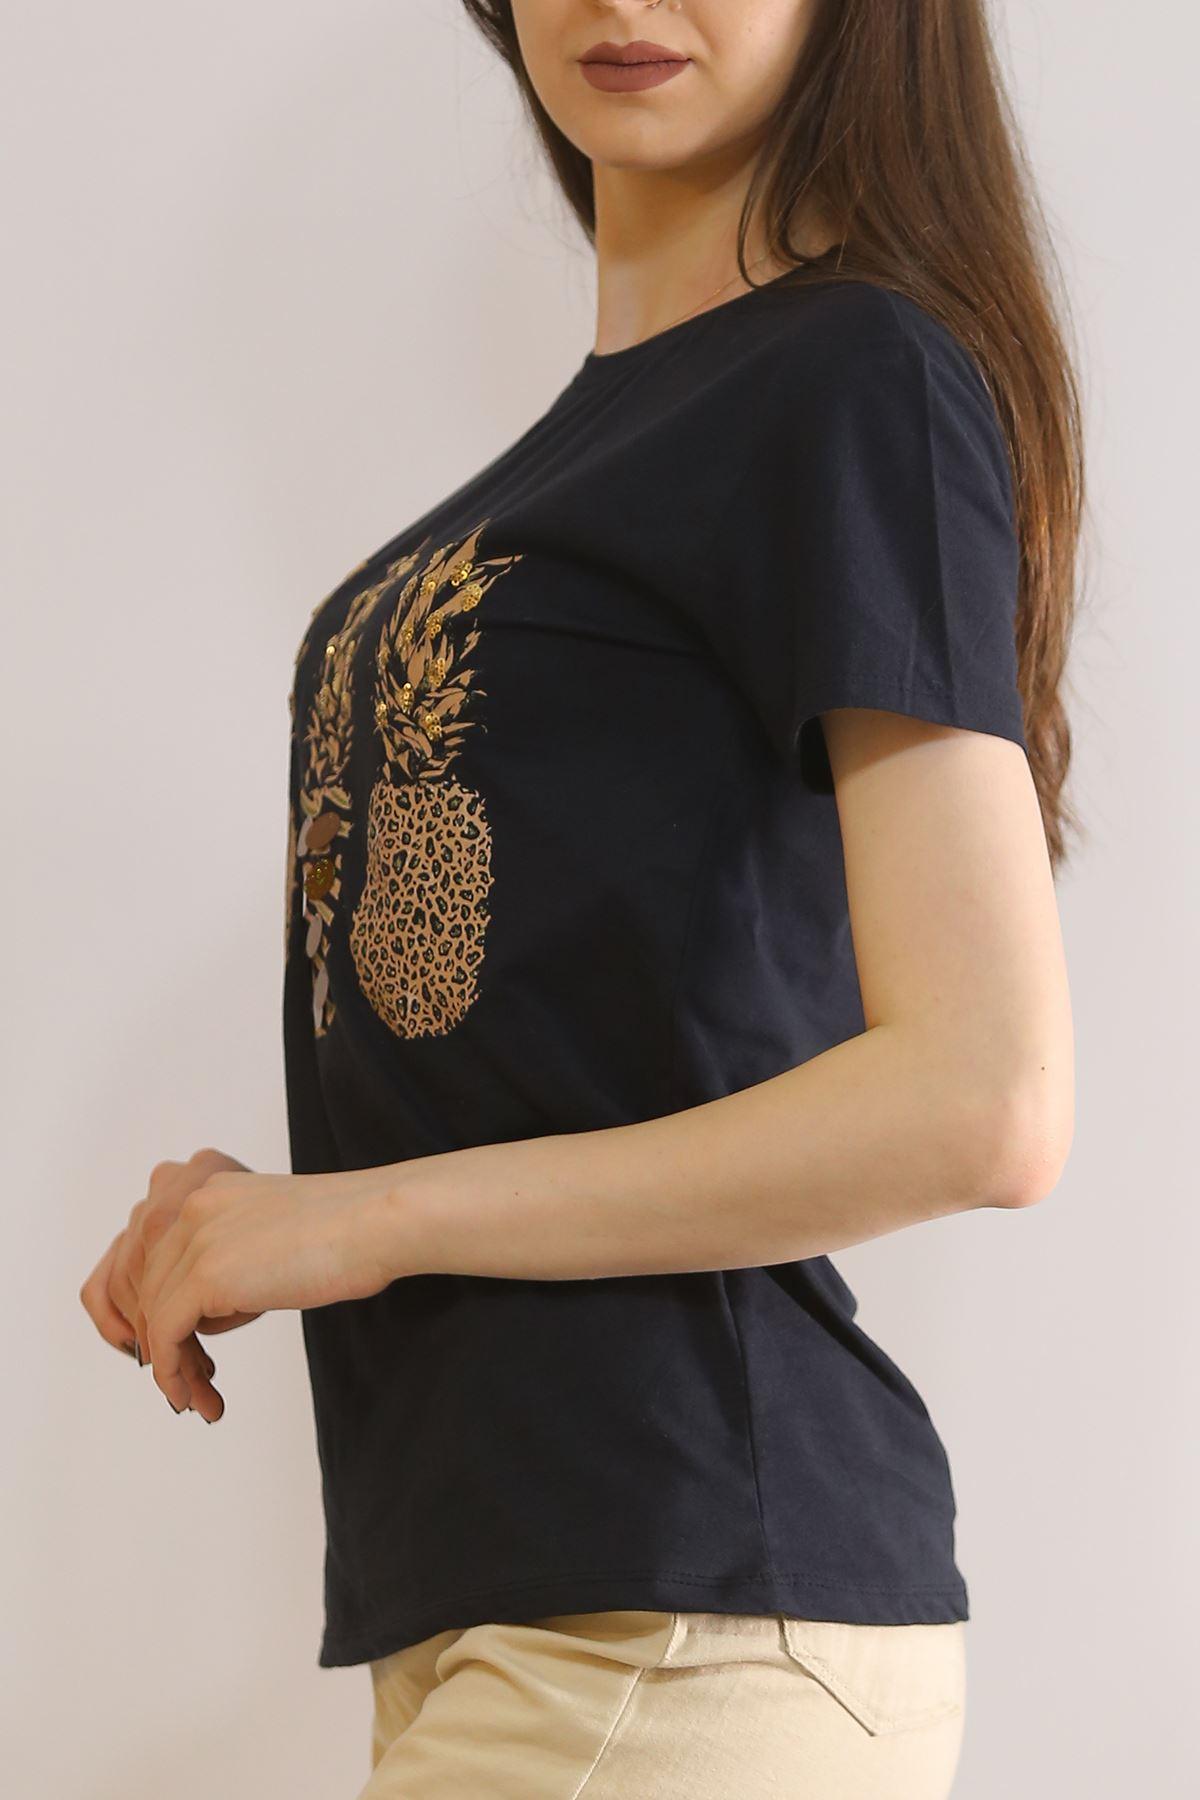 Ananas Baskılı Tişört Siyah - 5851.336.